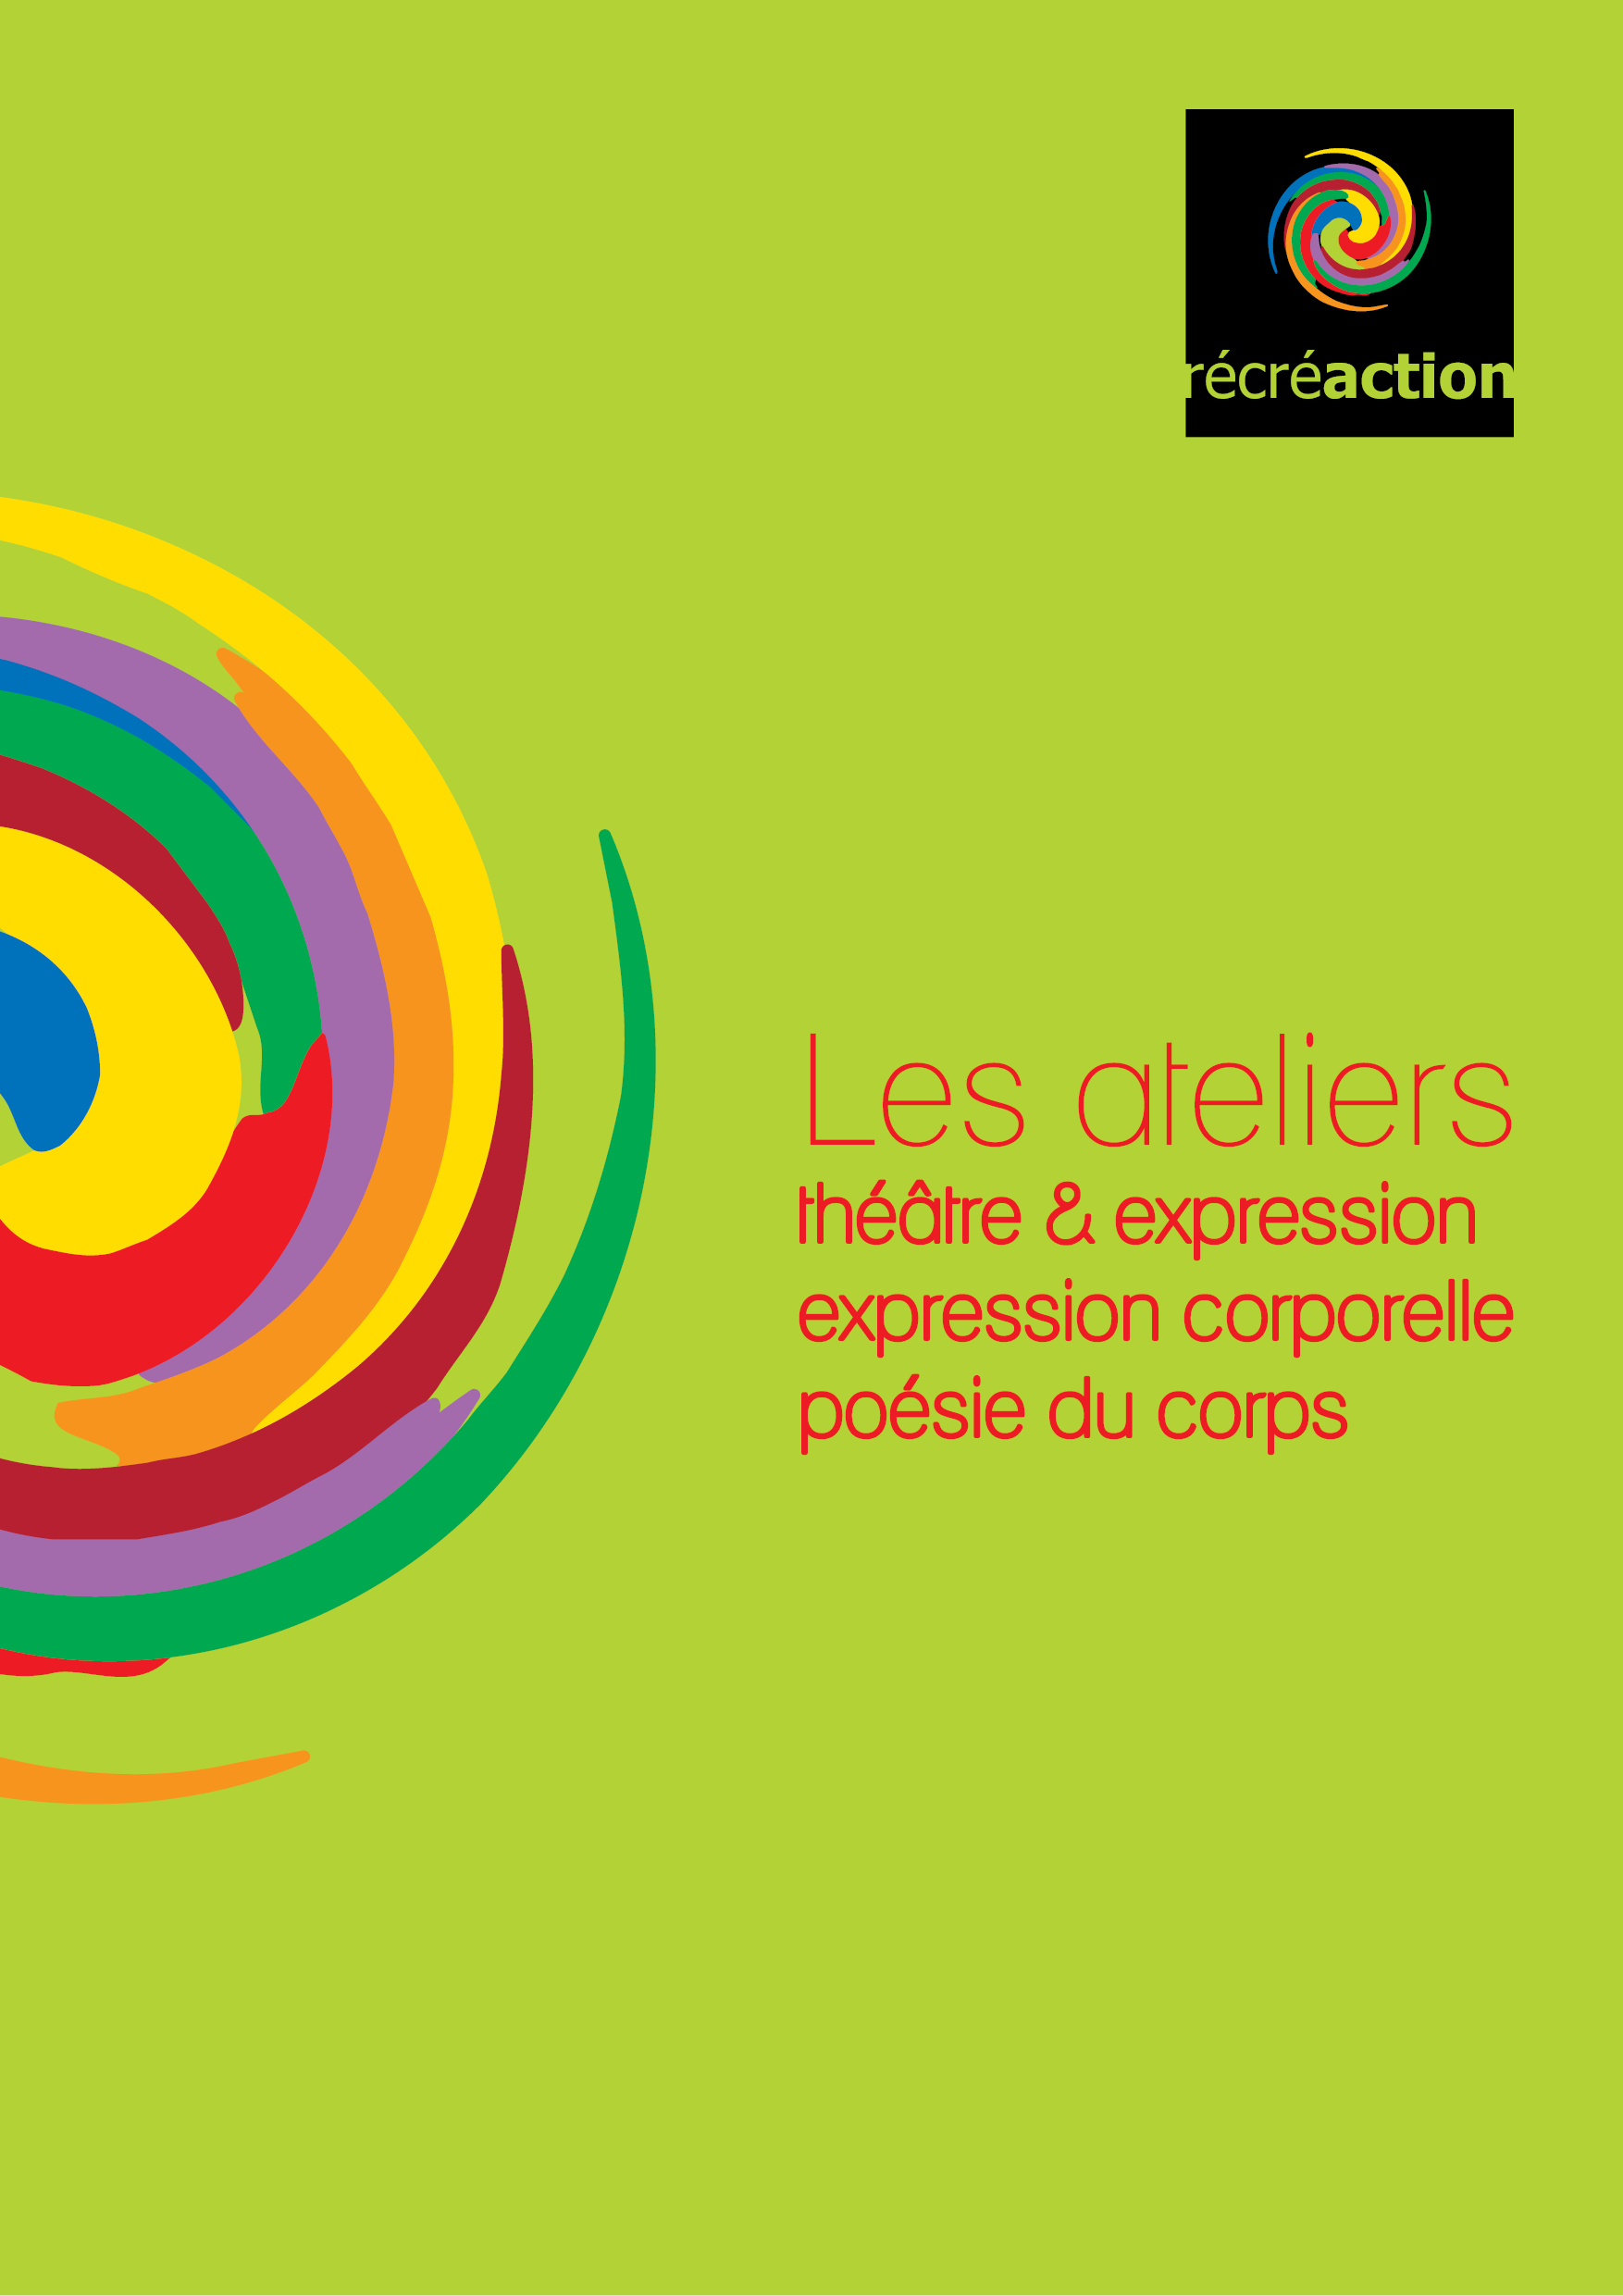 recreaction_plaquette_ateliers_p1